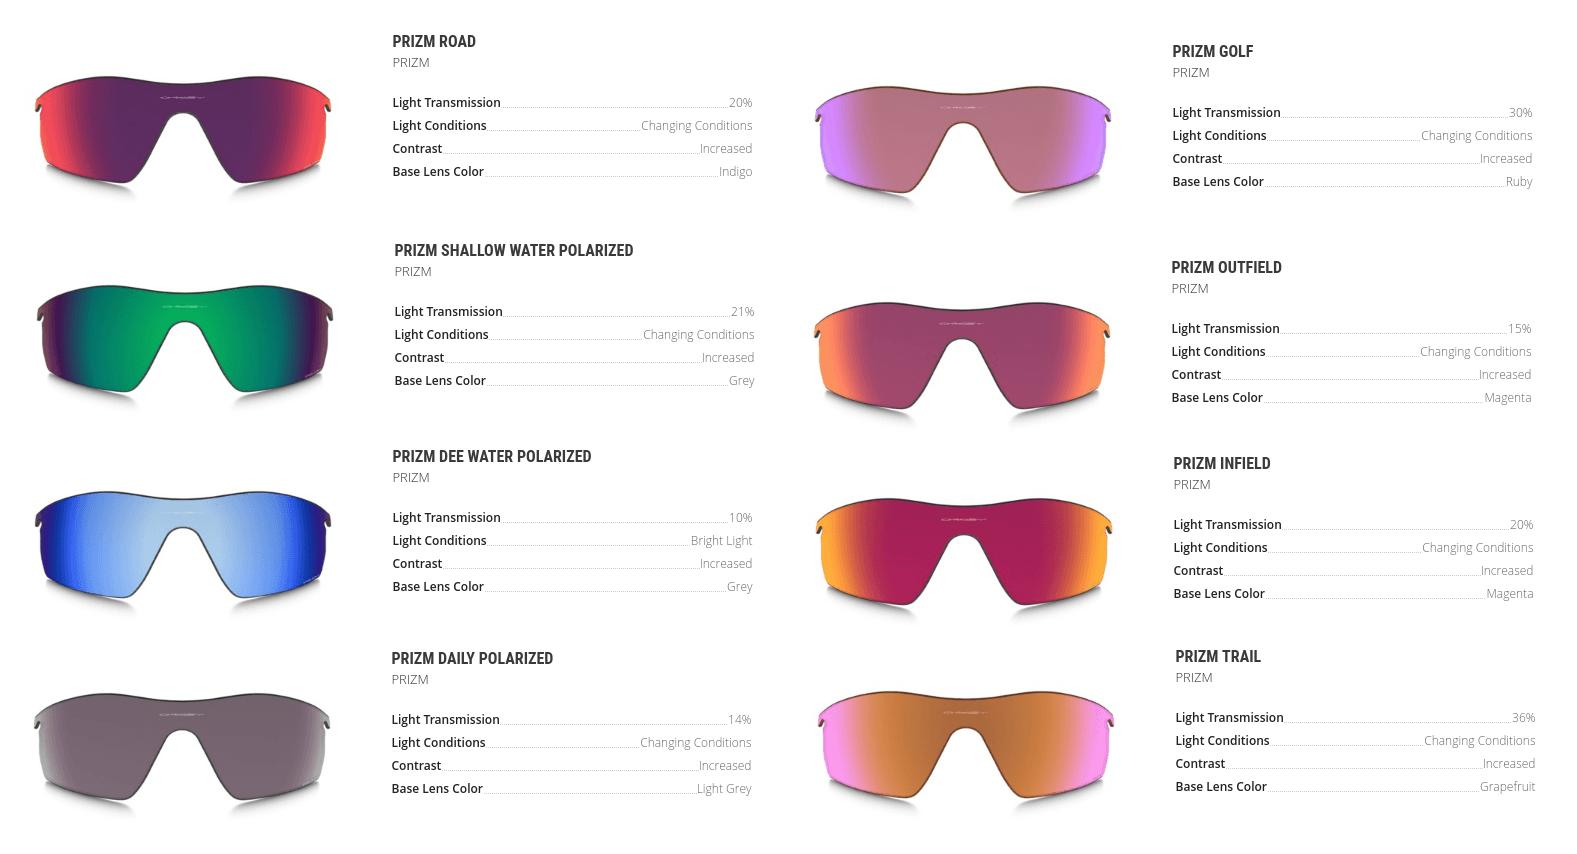 oakley prizm sunglasses lenses